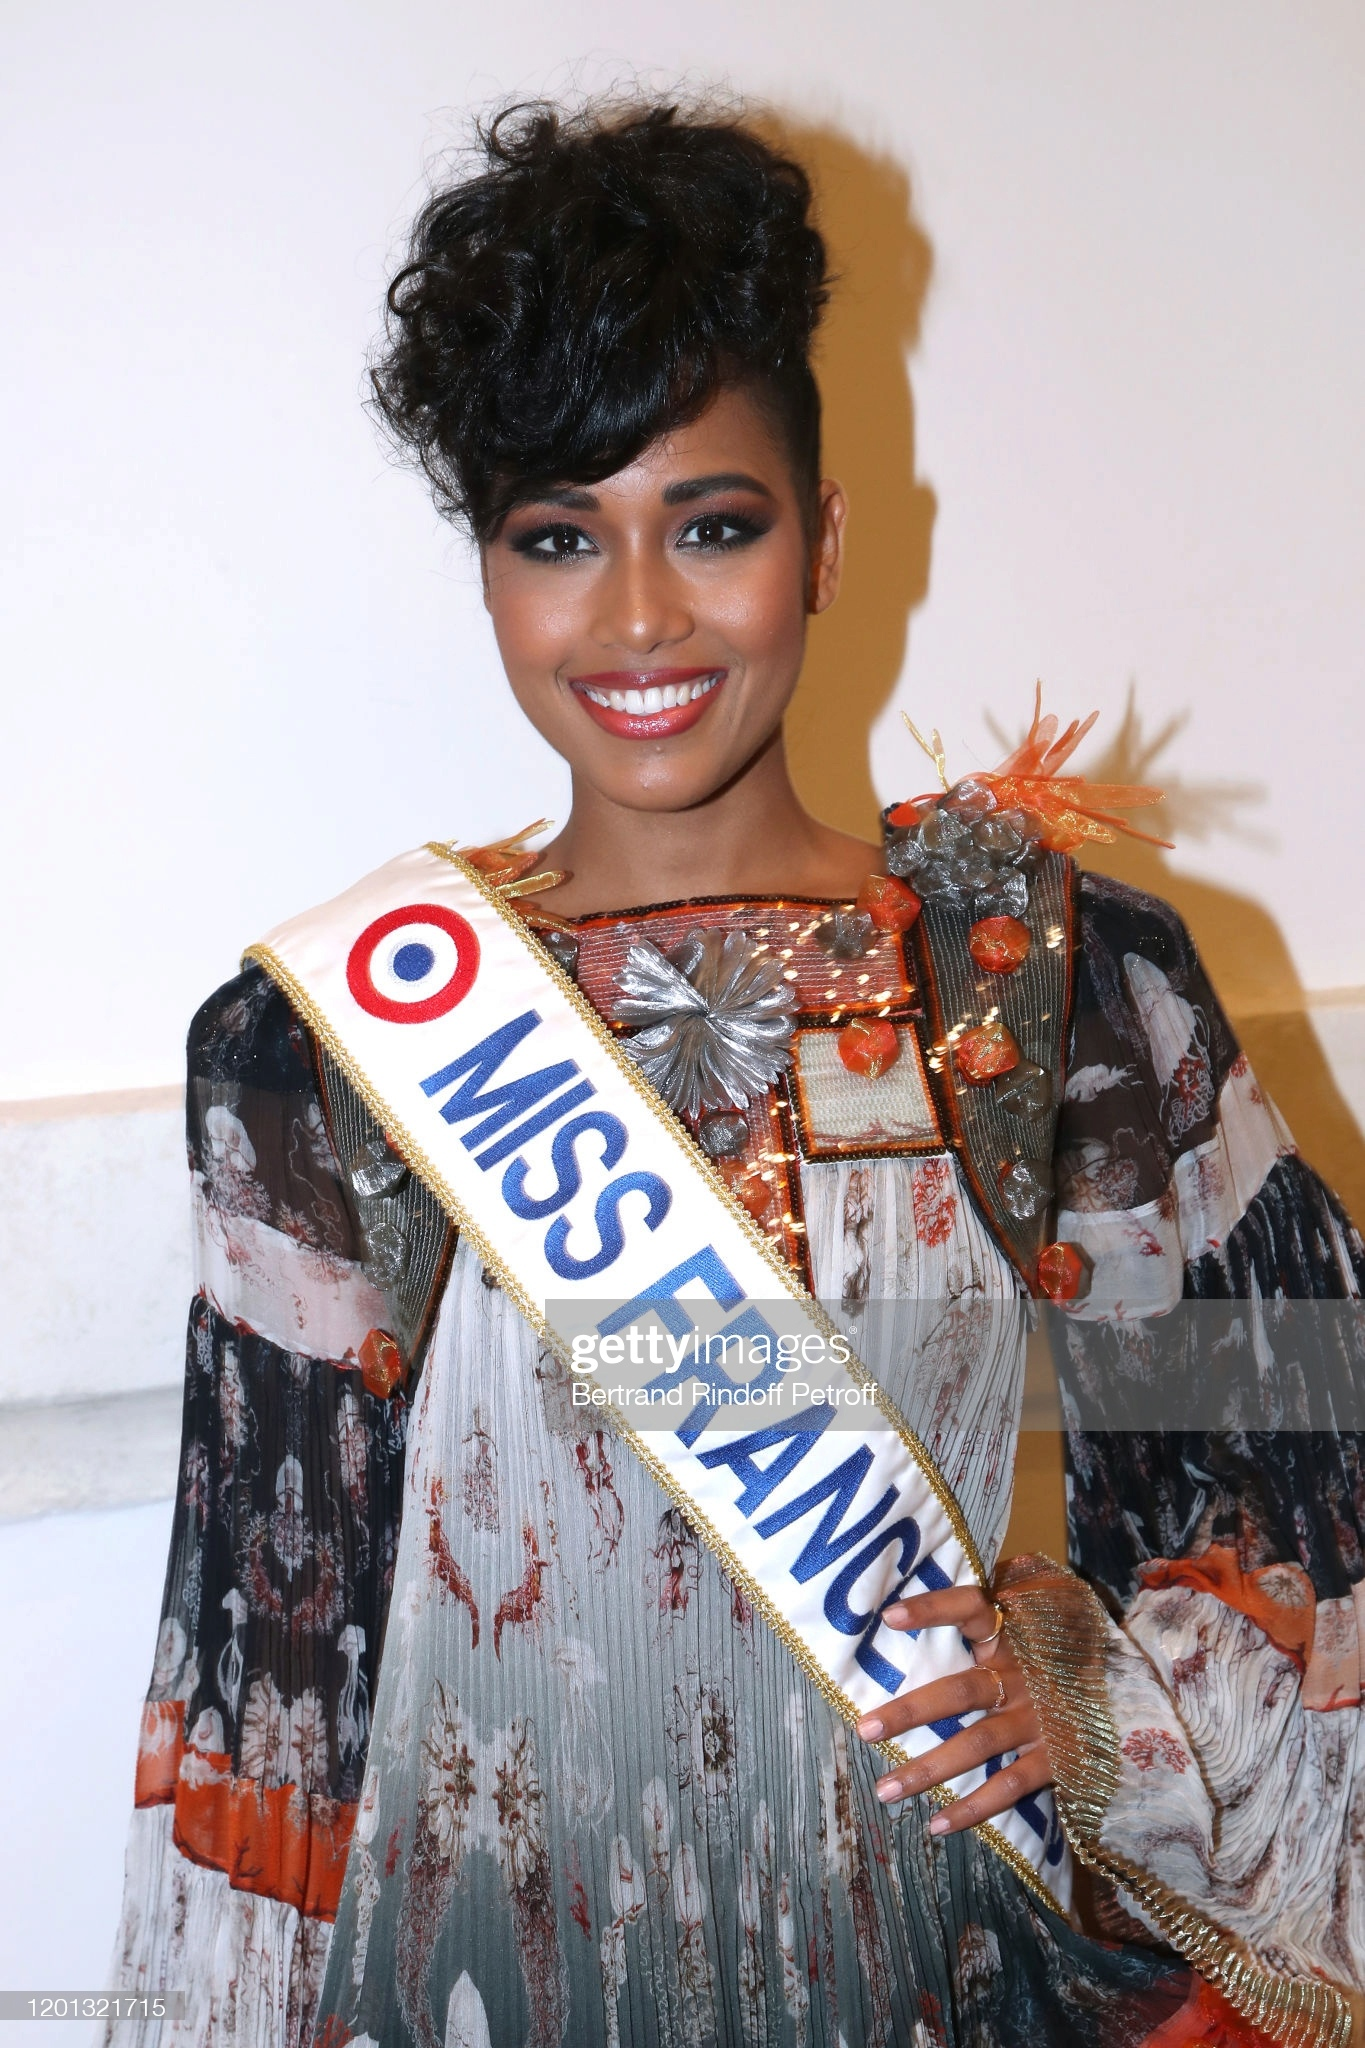 clemence botino, candidata a miss universe 2021. - Página 2 13504381